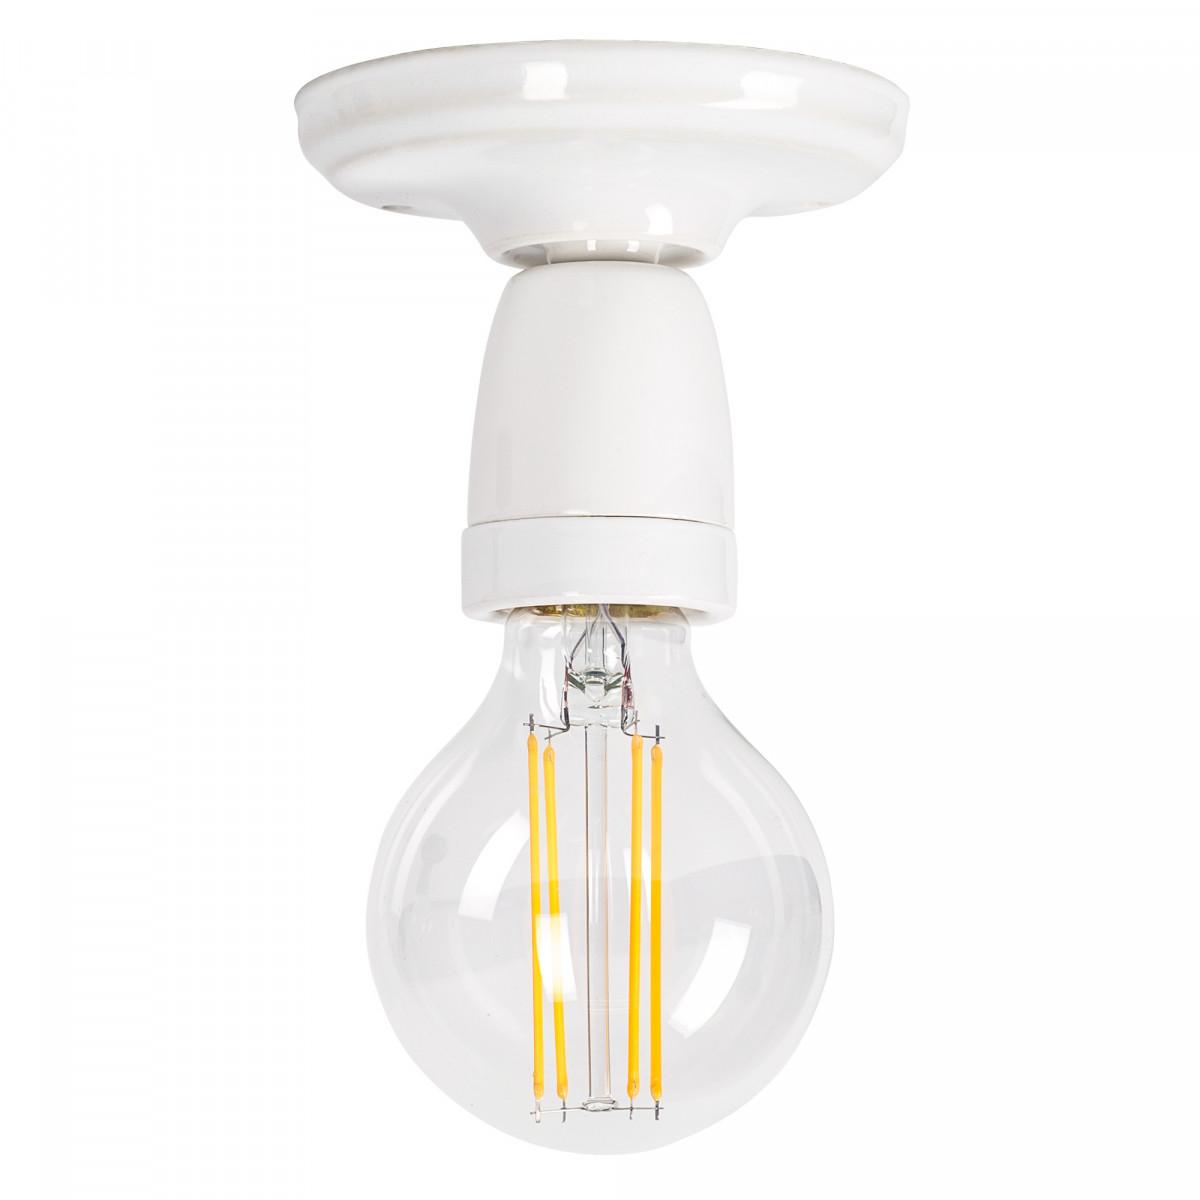 Plafondlamp Mir wit